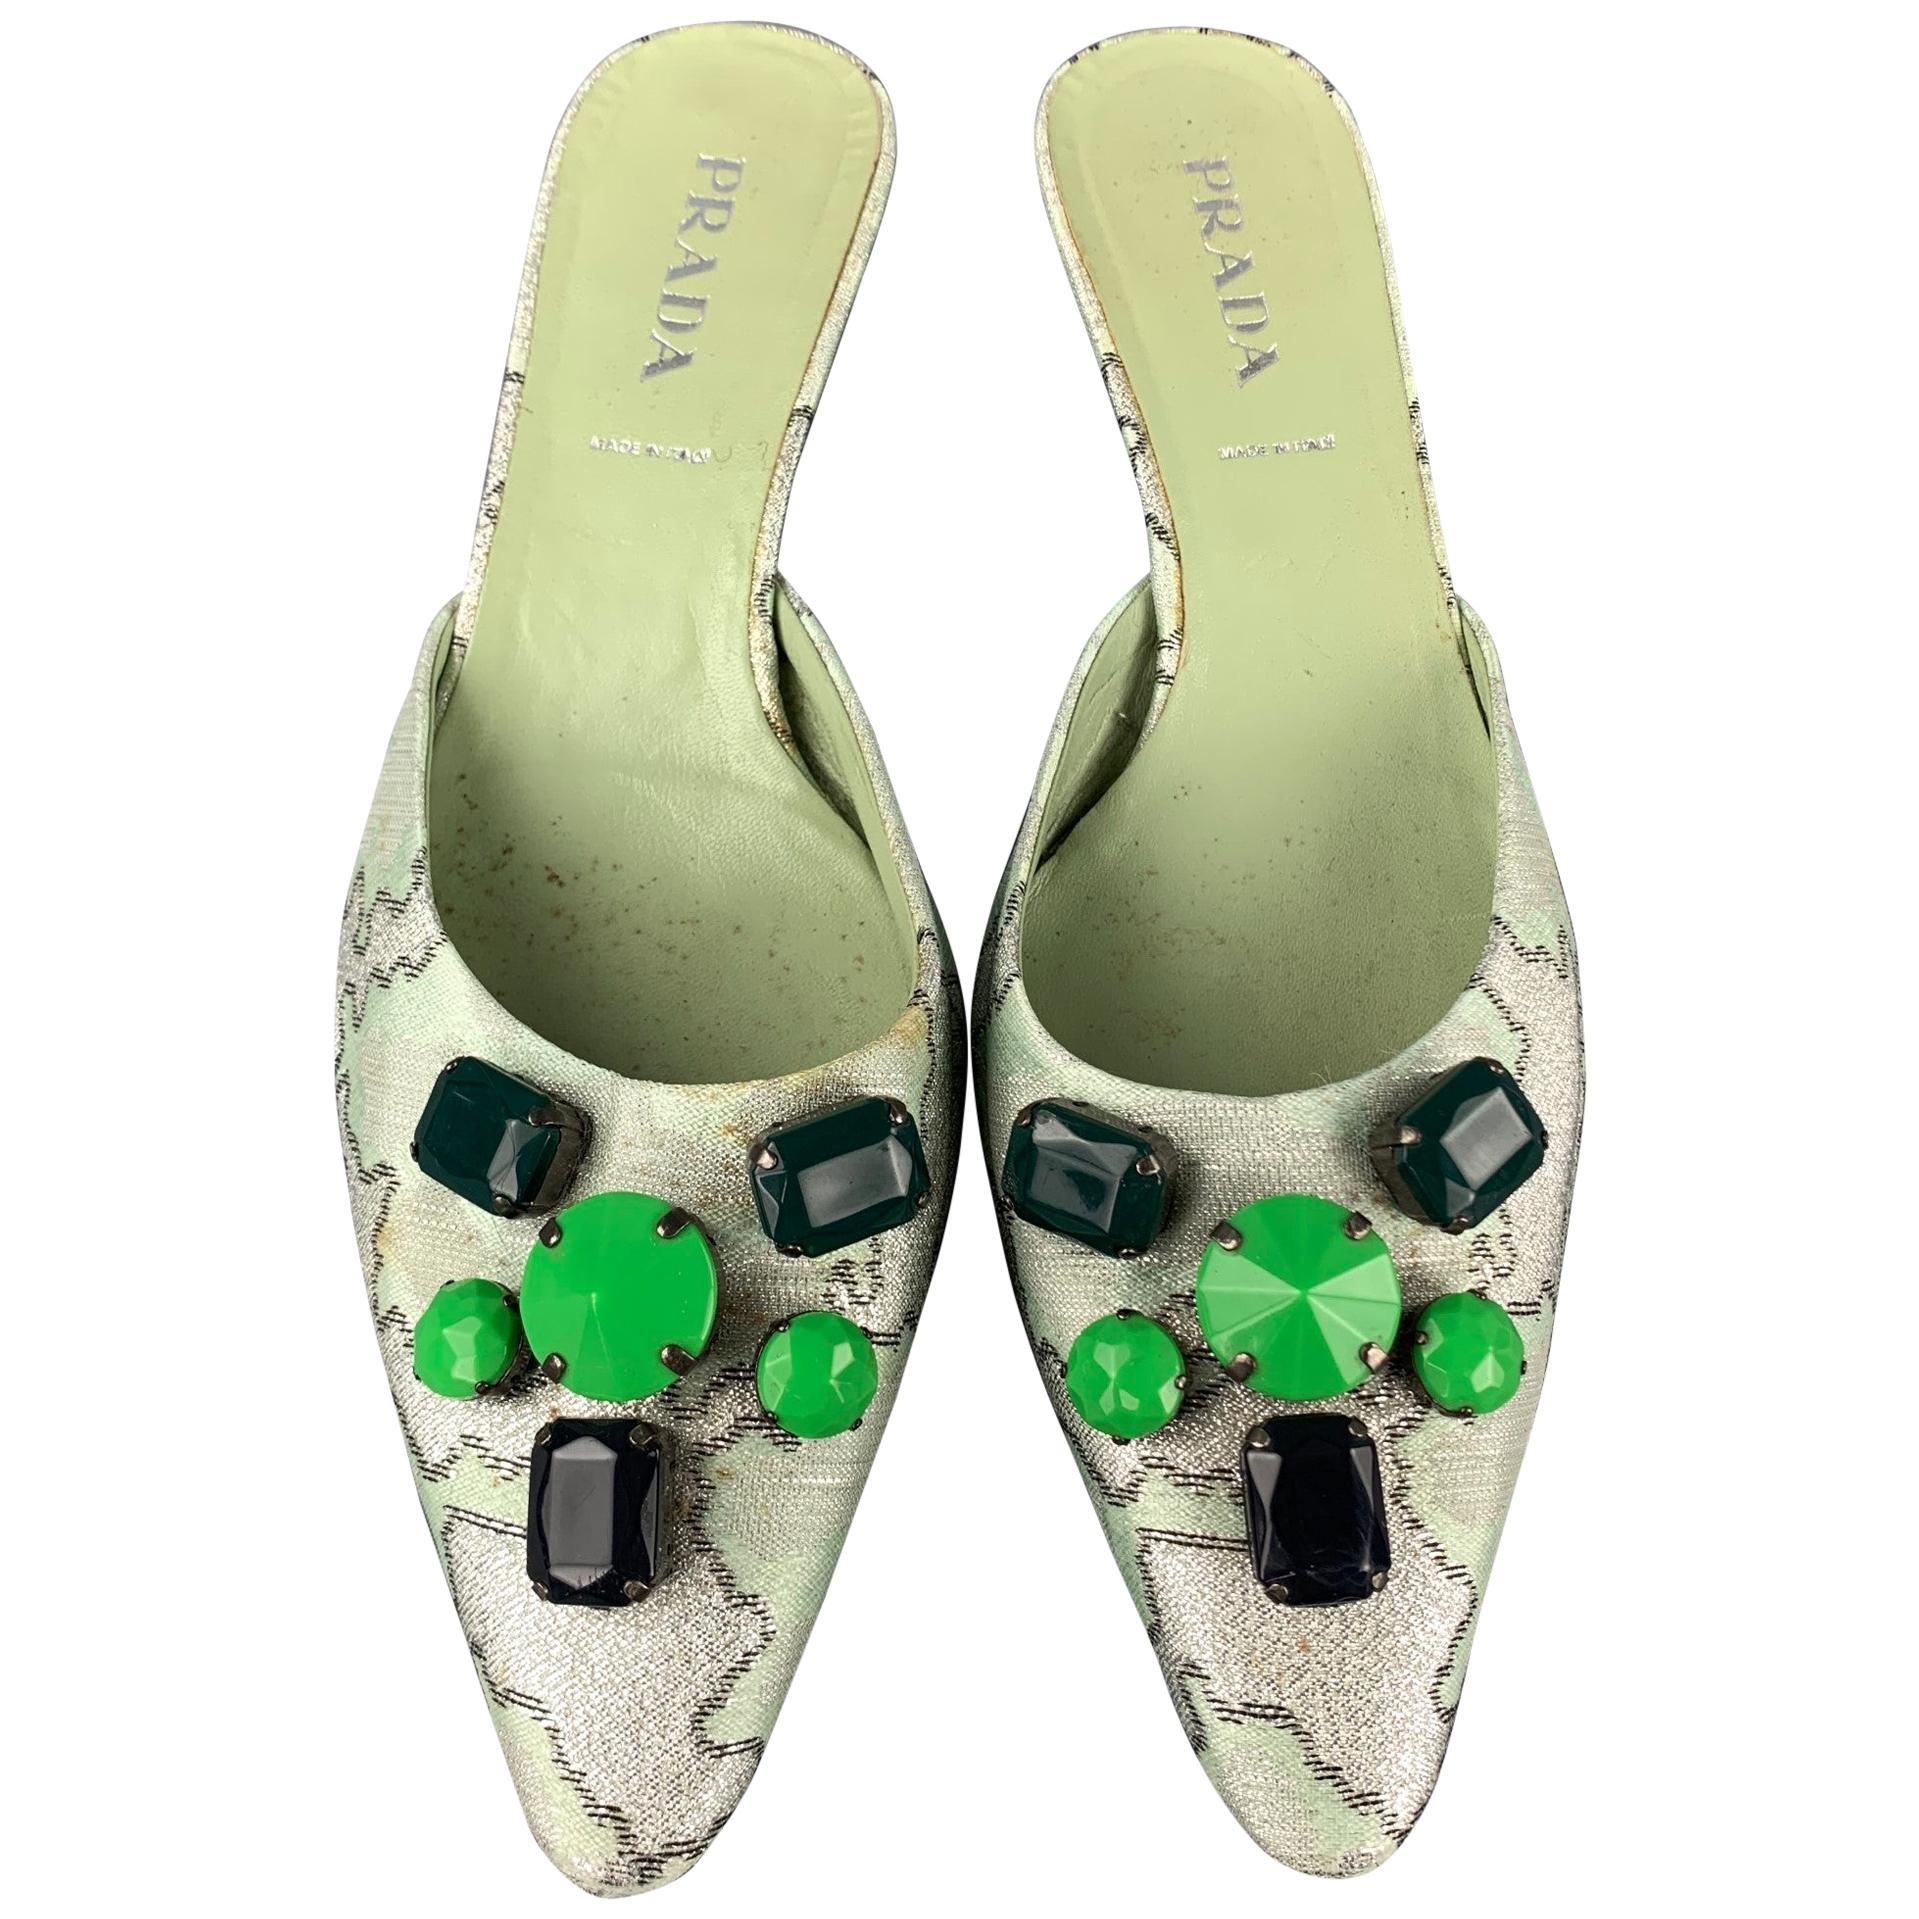 PRADA Size 8.5 Green Embellishments Silk Kitten Heel Pumps